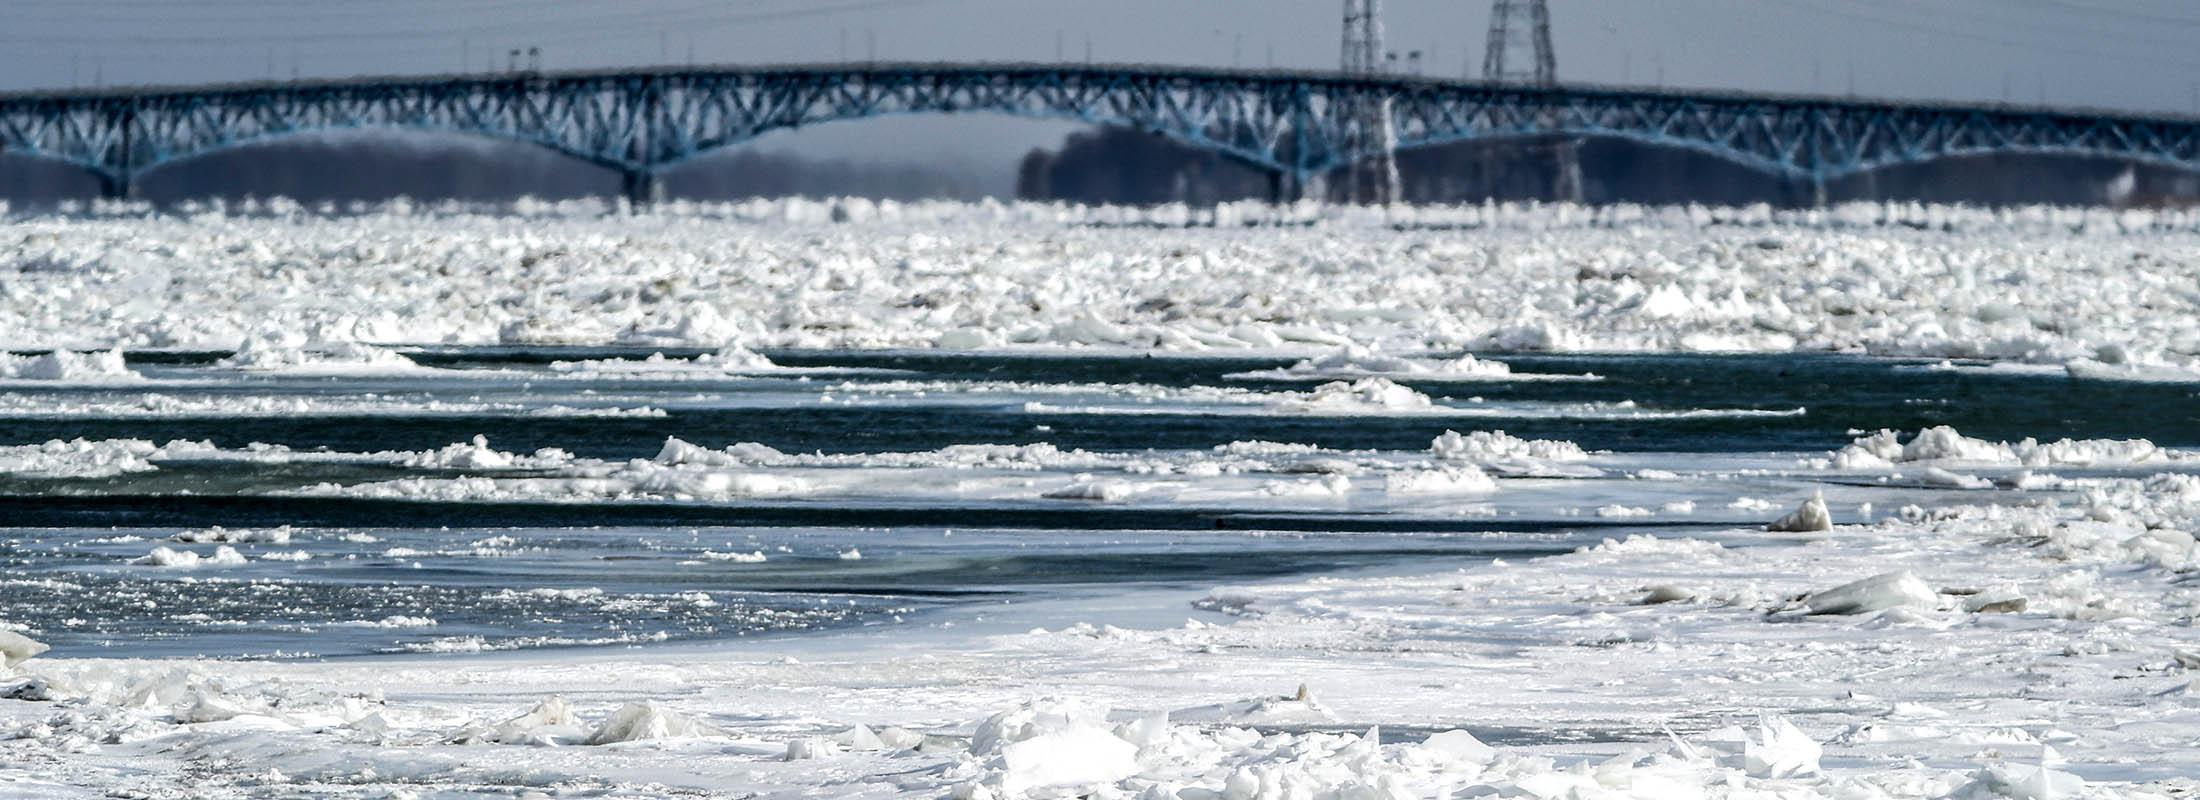 The bright sun light shines over the ice and water on the Niagara River near Niagara Falls on Jan. 31. (James P. McCoy/Buffalo News)